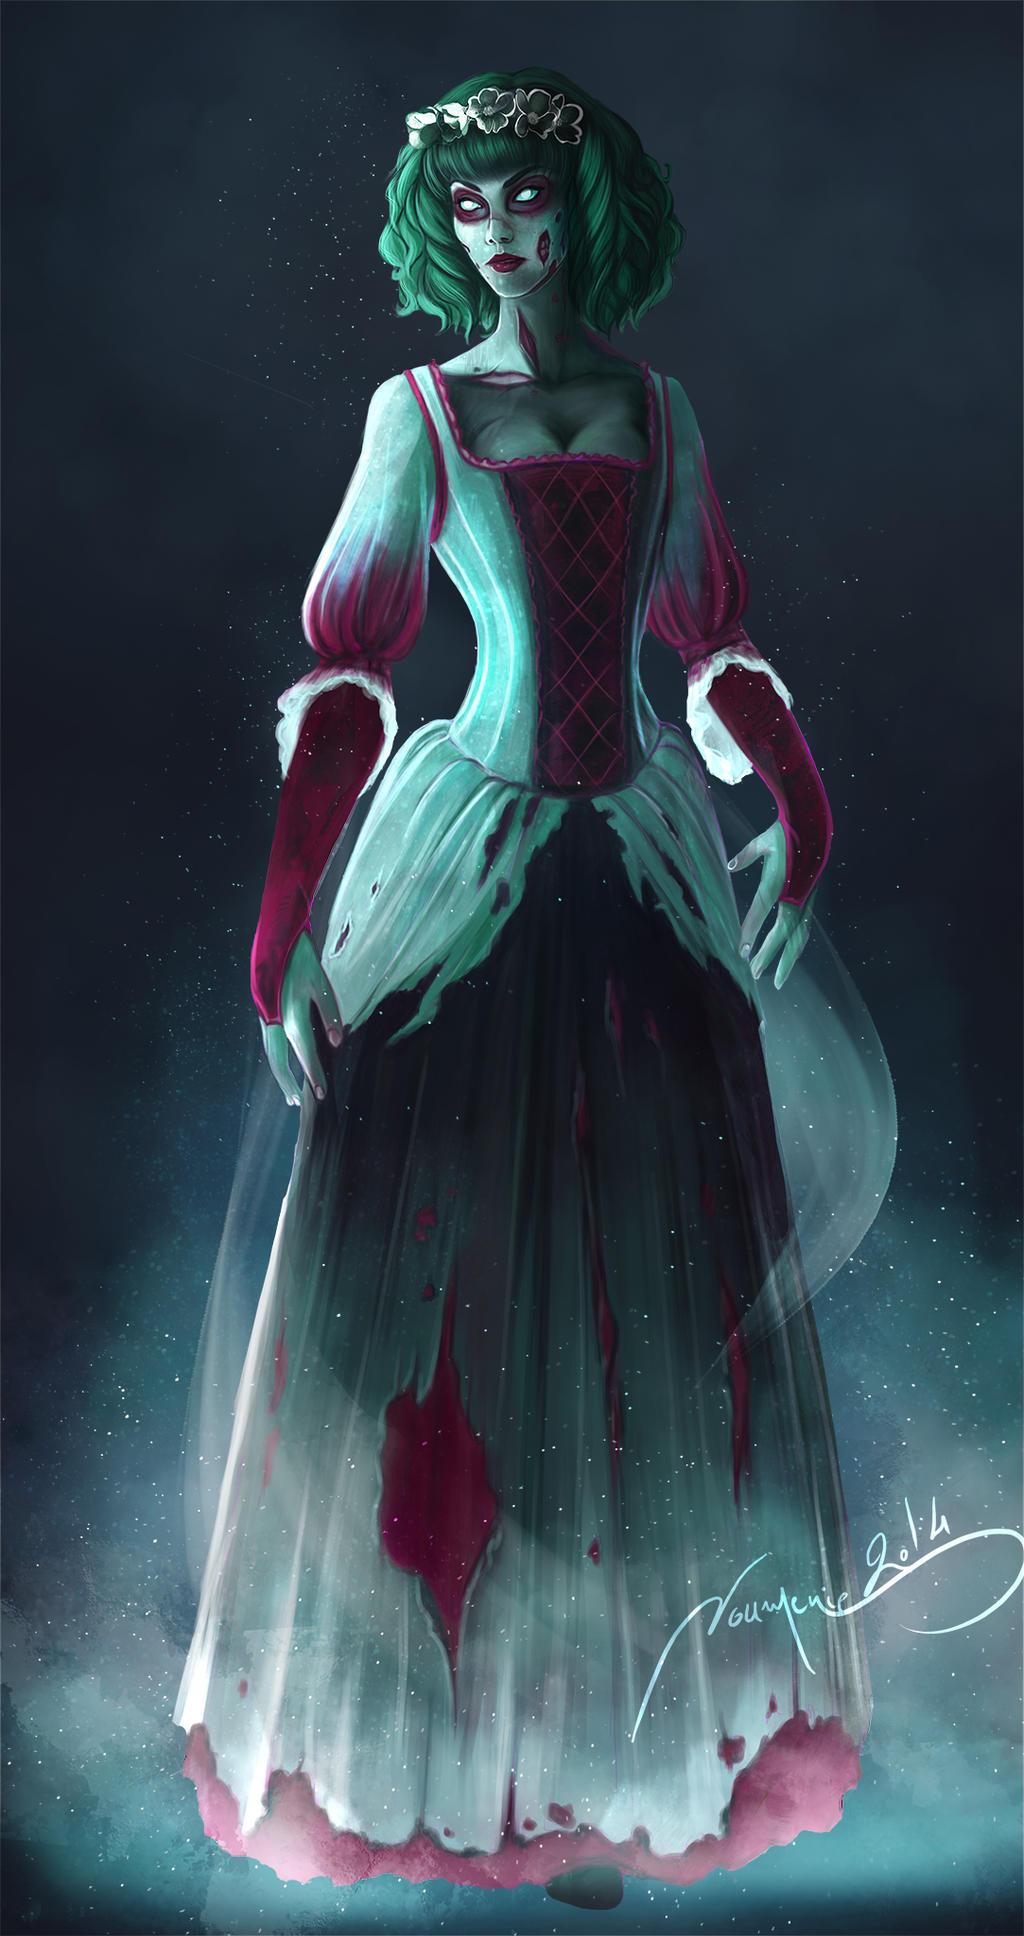 Nos créaZions - Page 18 Zombie_girl___3_4_face___indie_project_by_noumenie-d80ik2j